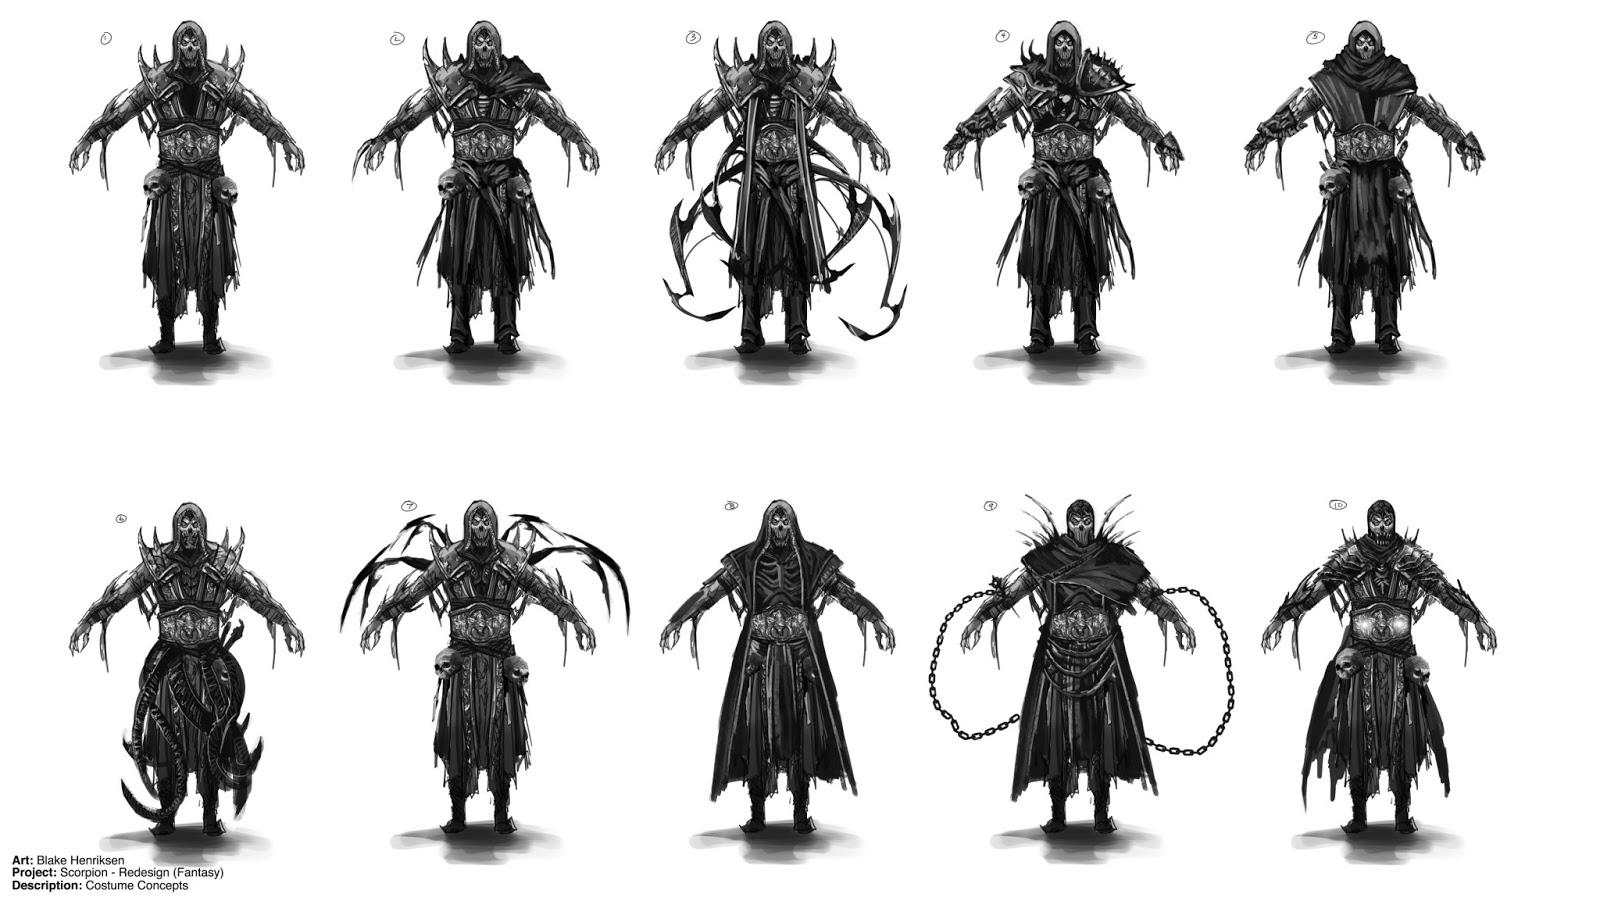 http://2.bp.blogspot.com/-6s4iZ8HZc0A/UVowAIJ6u7I/AAAAAAAAAkw/naquJdkJeu0/s1600/Scorpion_Costume_Concepts.jpg